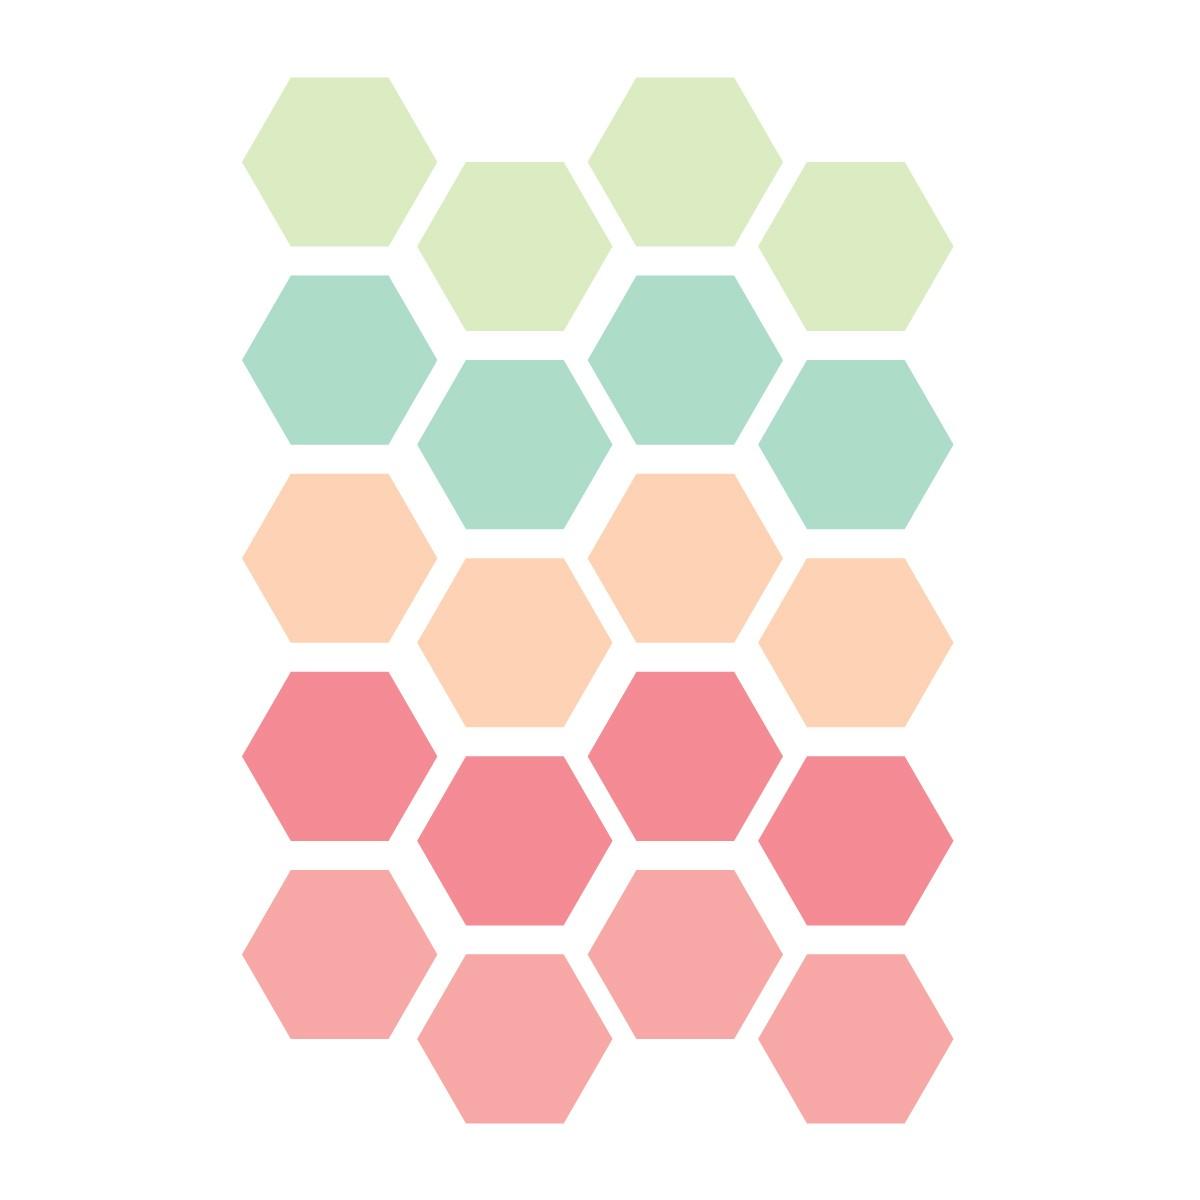 Hexagon Whiteboards Stickers